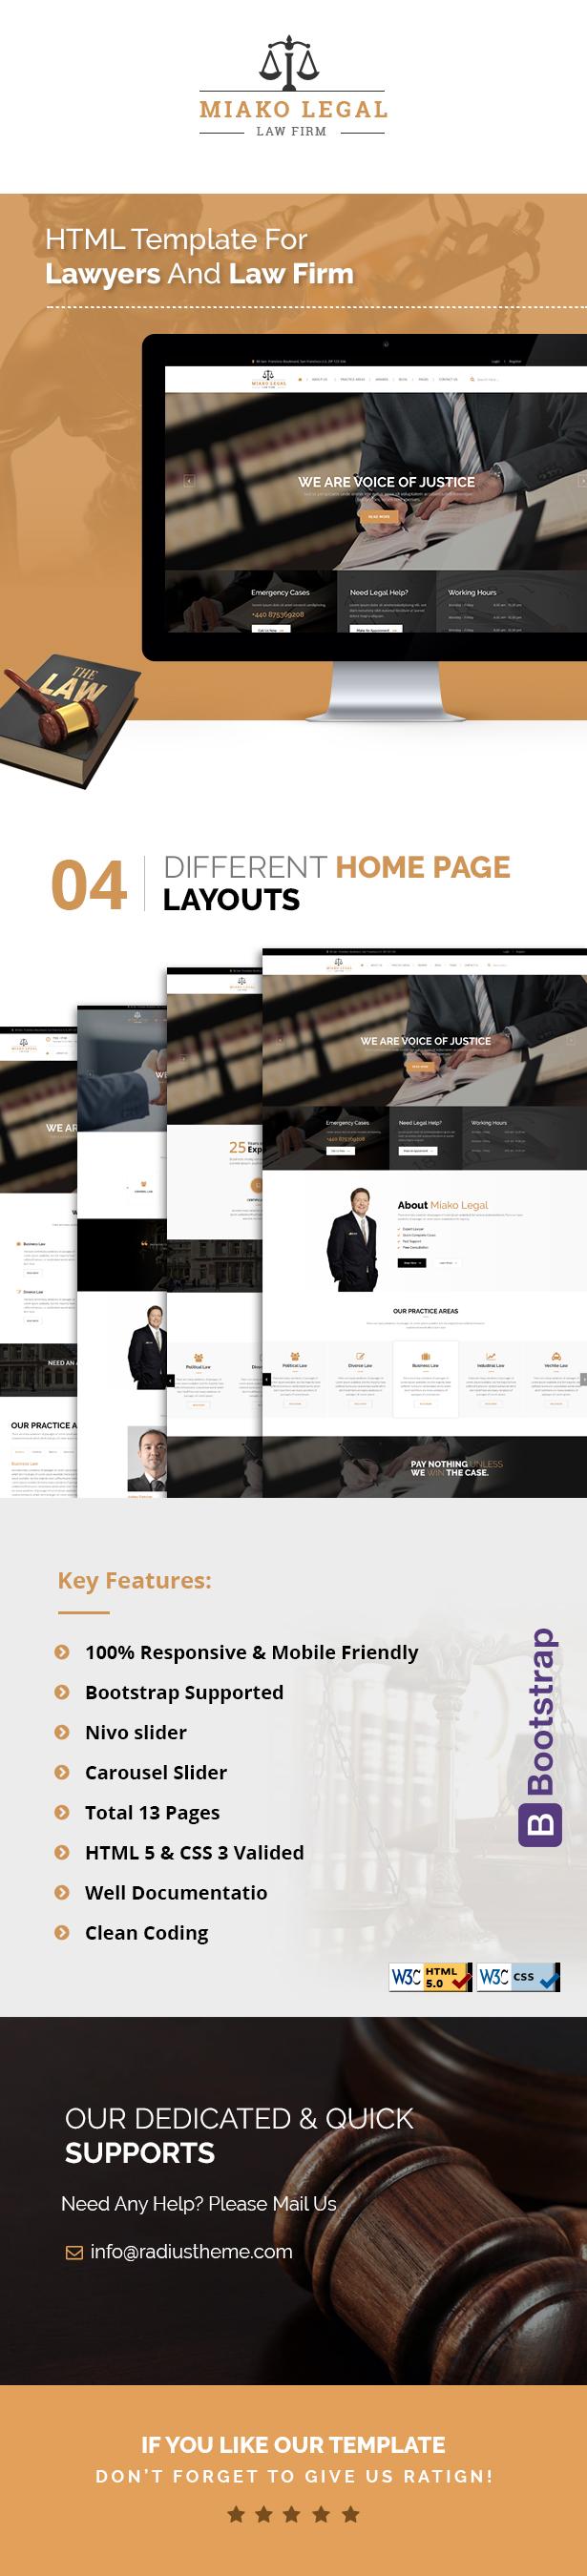 miakolegal Law firm html template